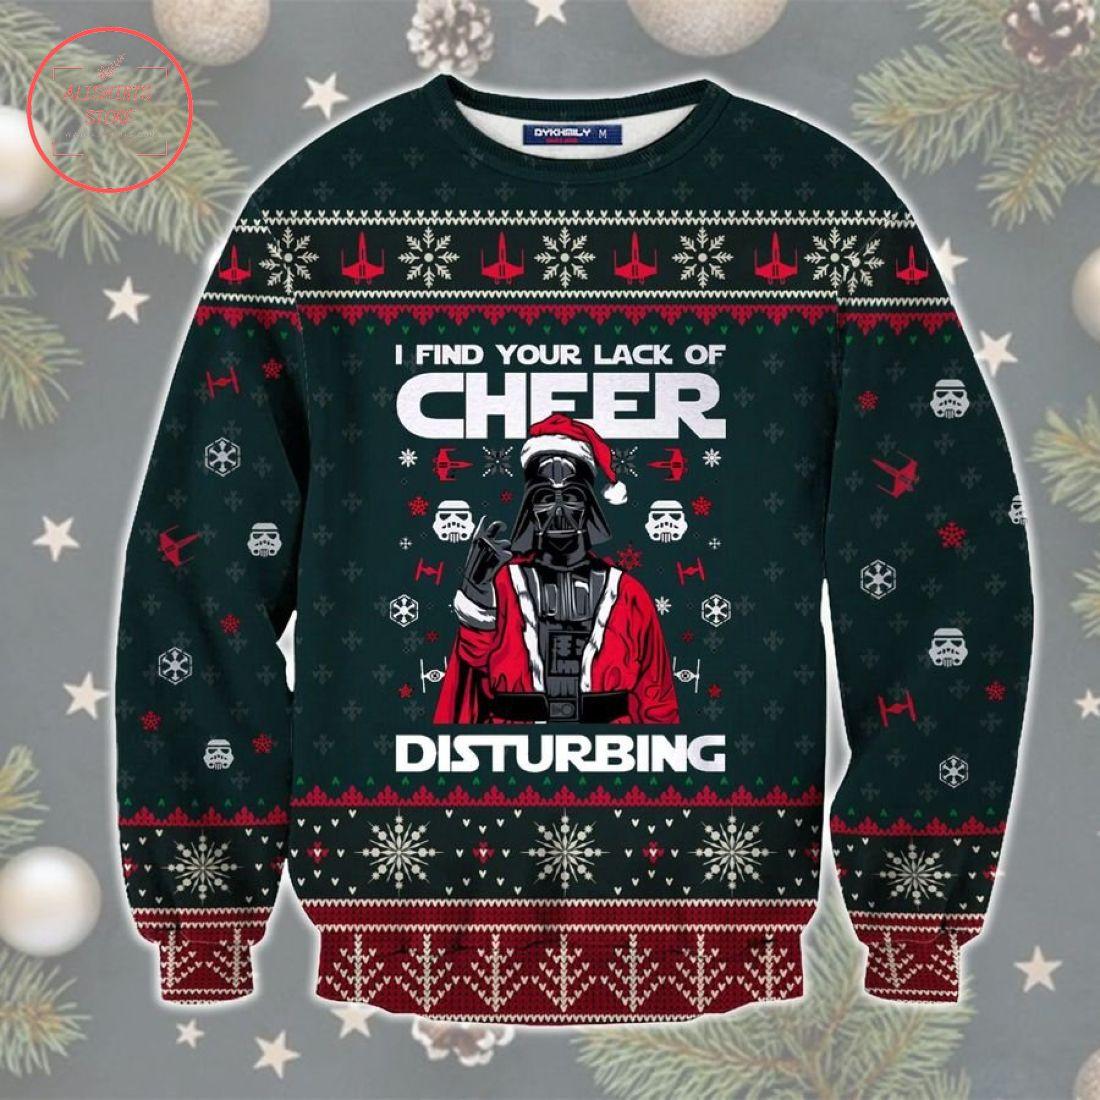 Cheer Disturbing Star Wars Ugly Christmas Sweater